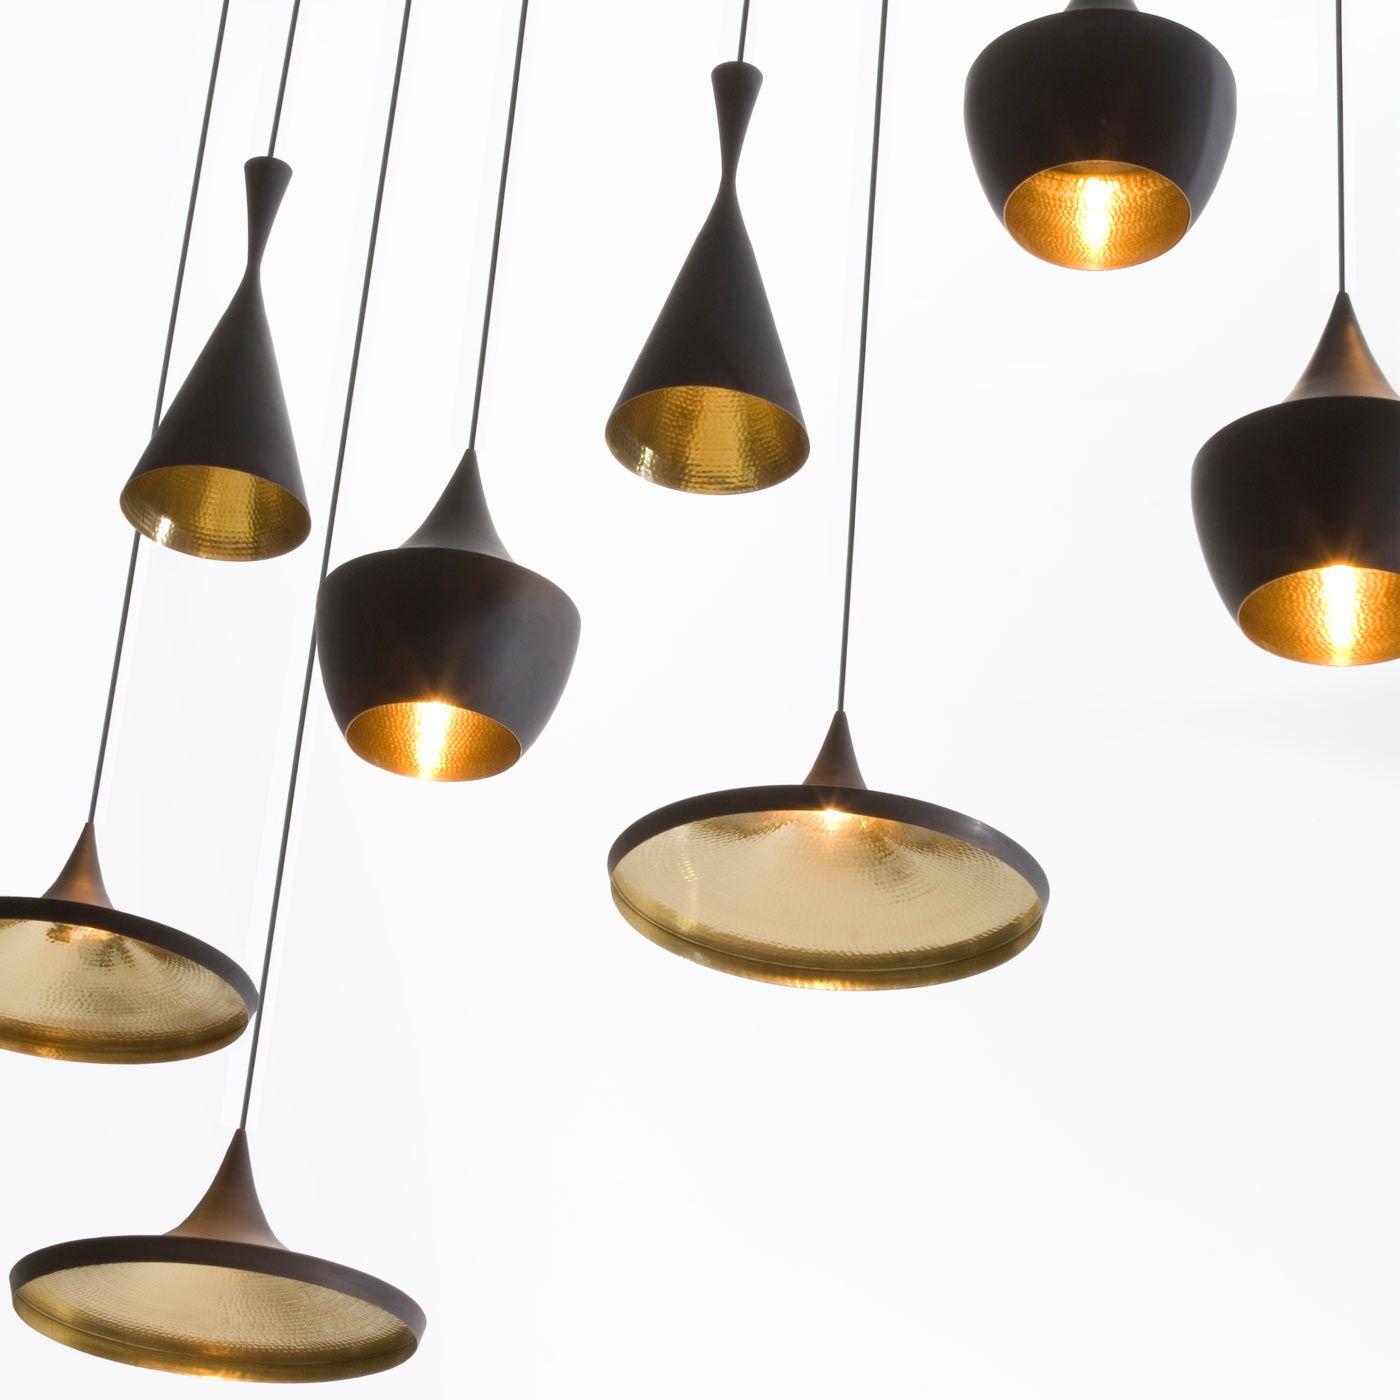 Tom Dixon Lights Pendelleuchte Tom Dixon Lampe Design Lampen